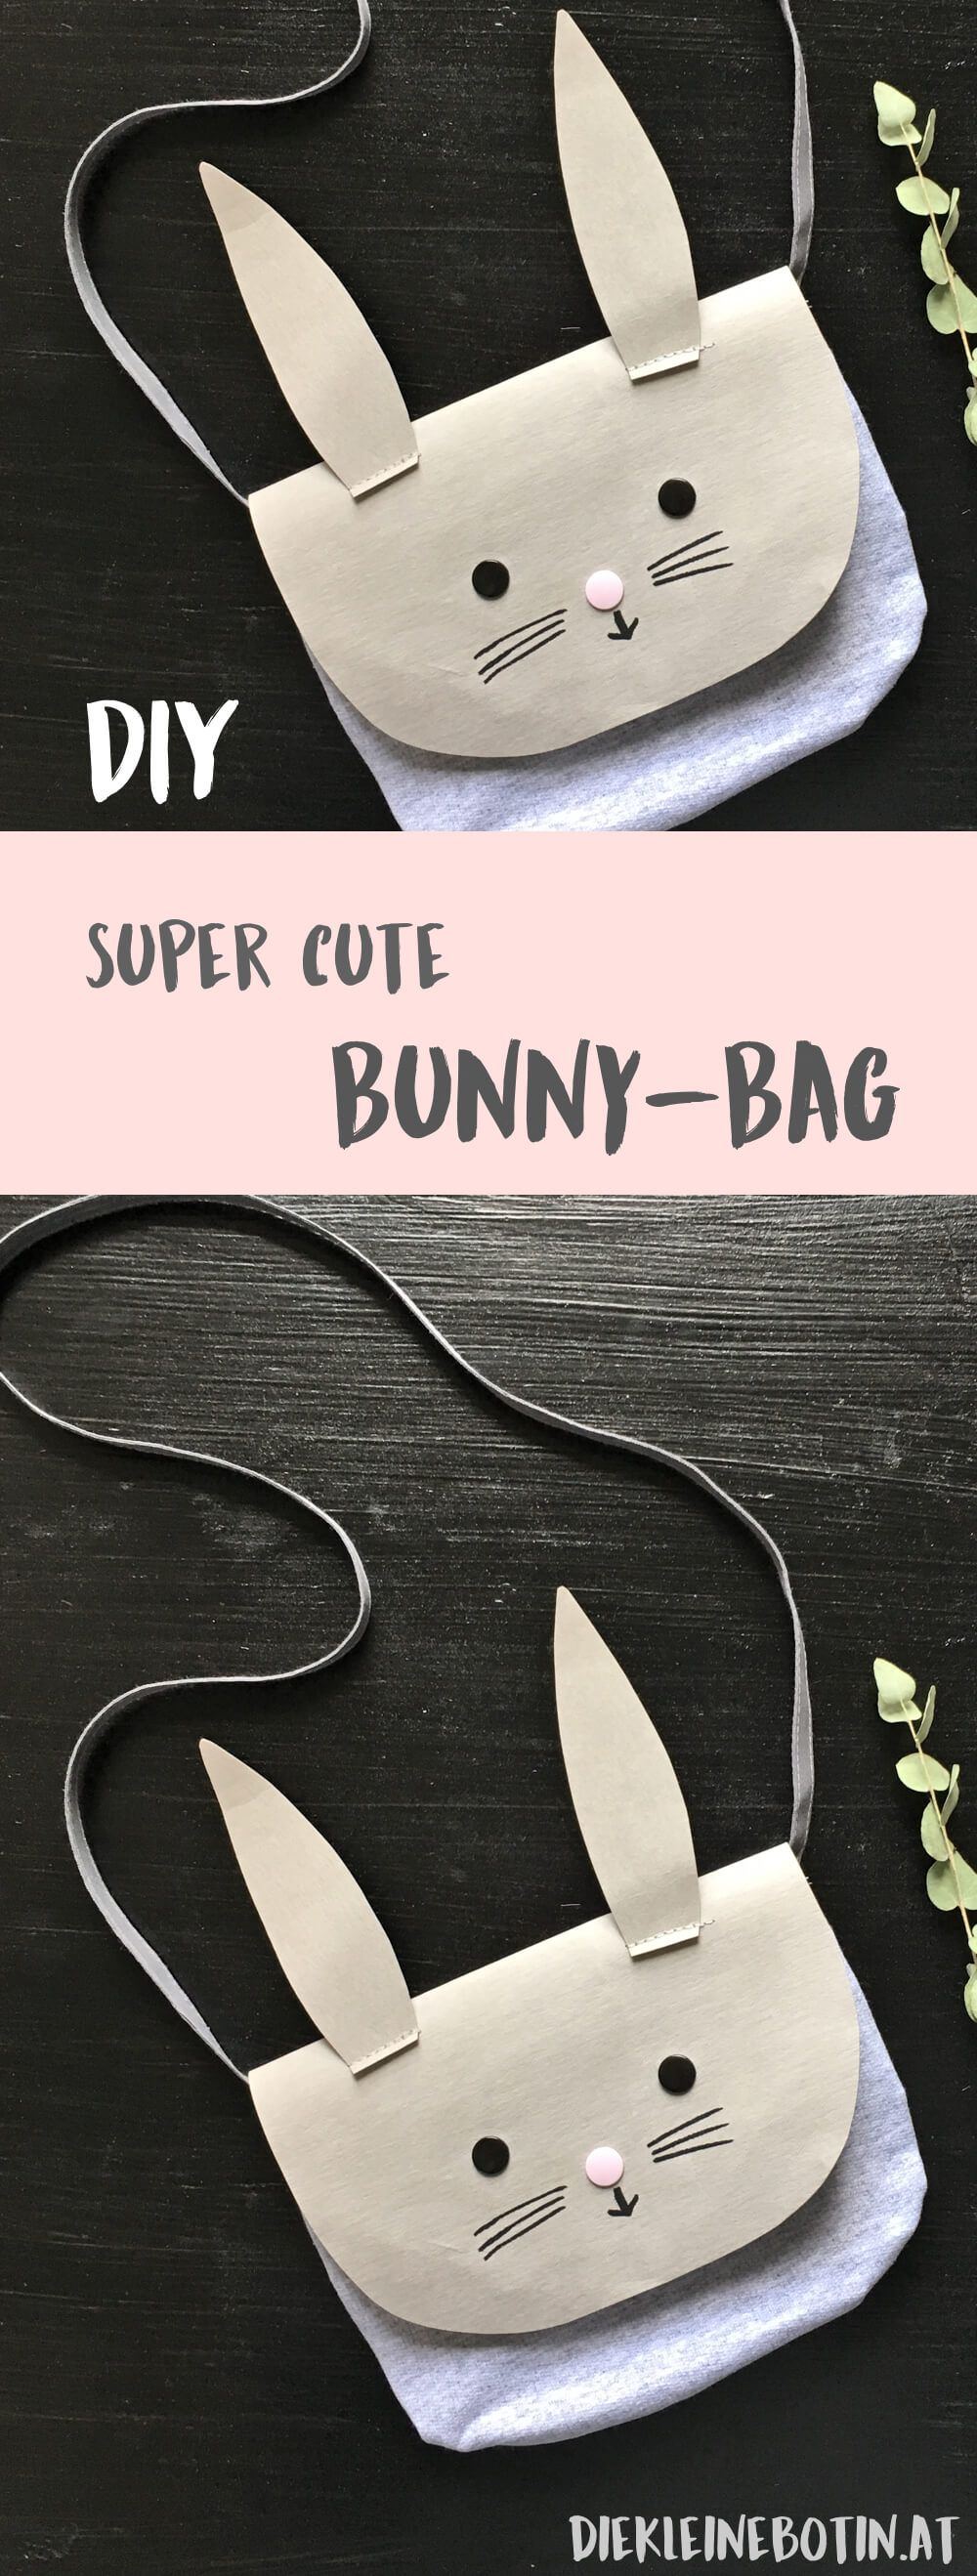 bunny bag pinterest snappap